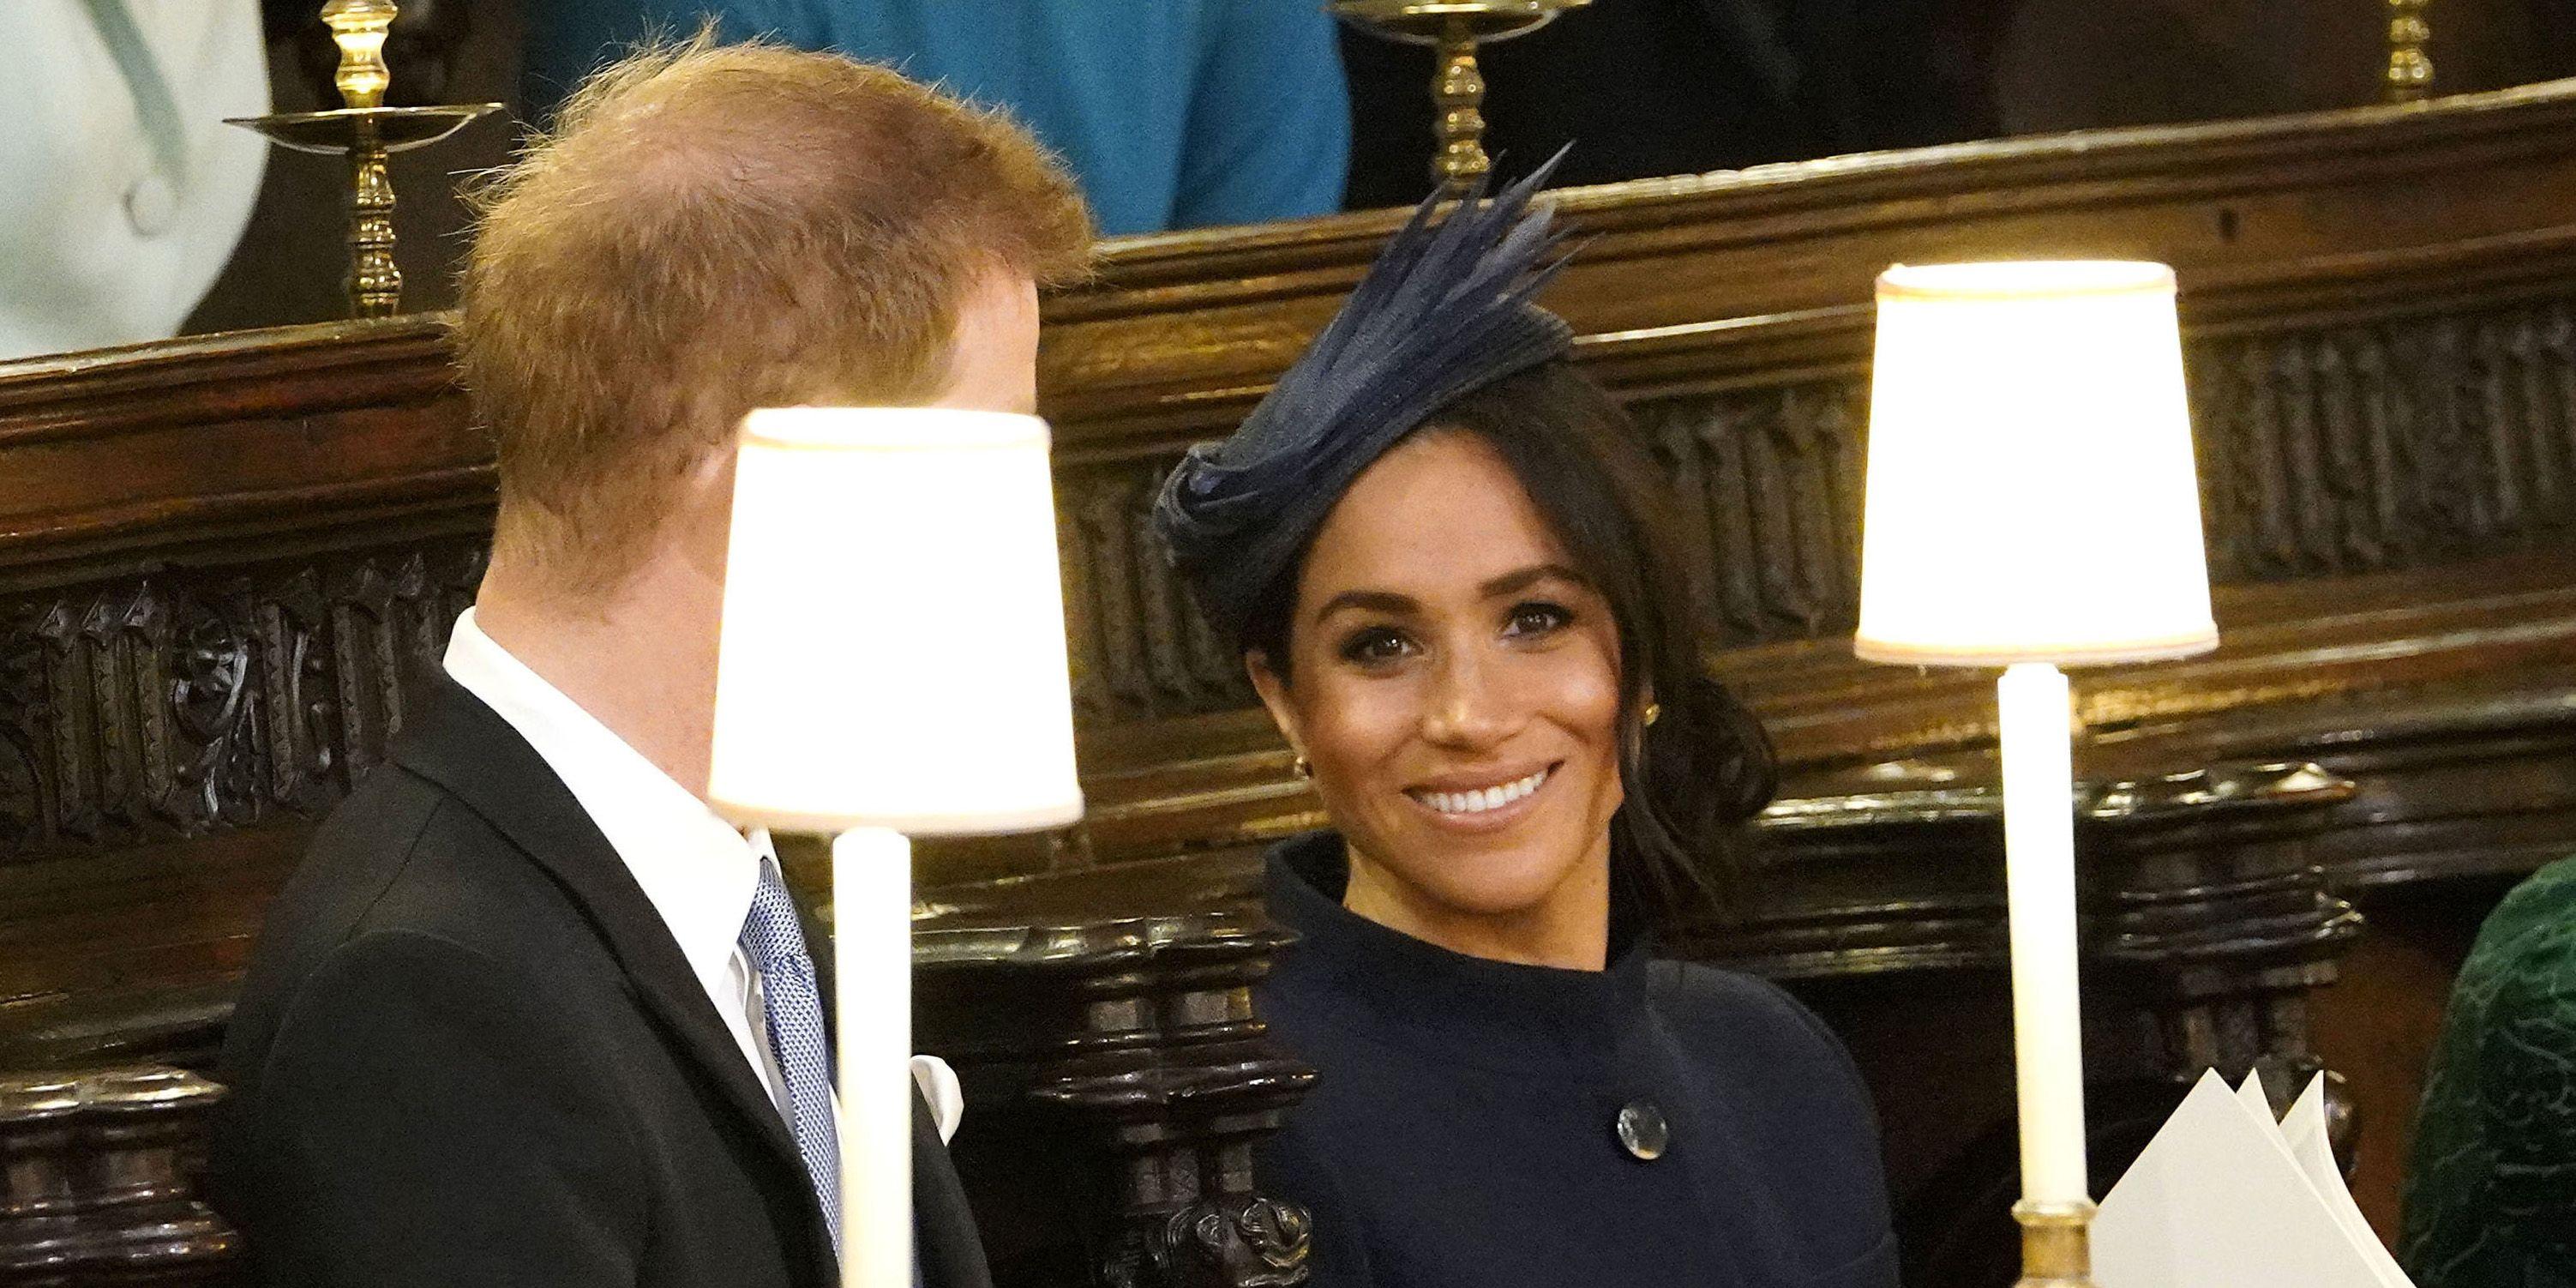 Meghan Markle en Prins Harry bij de royal wedding van Prinses Eugenie